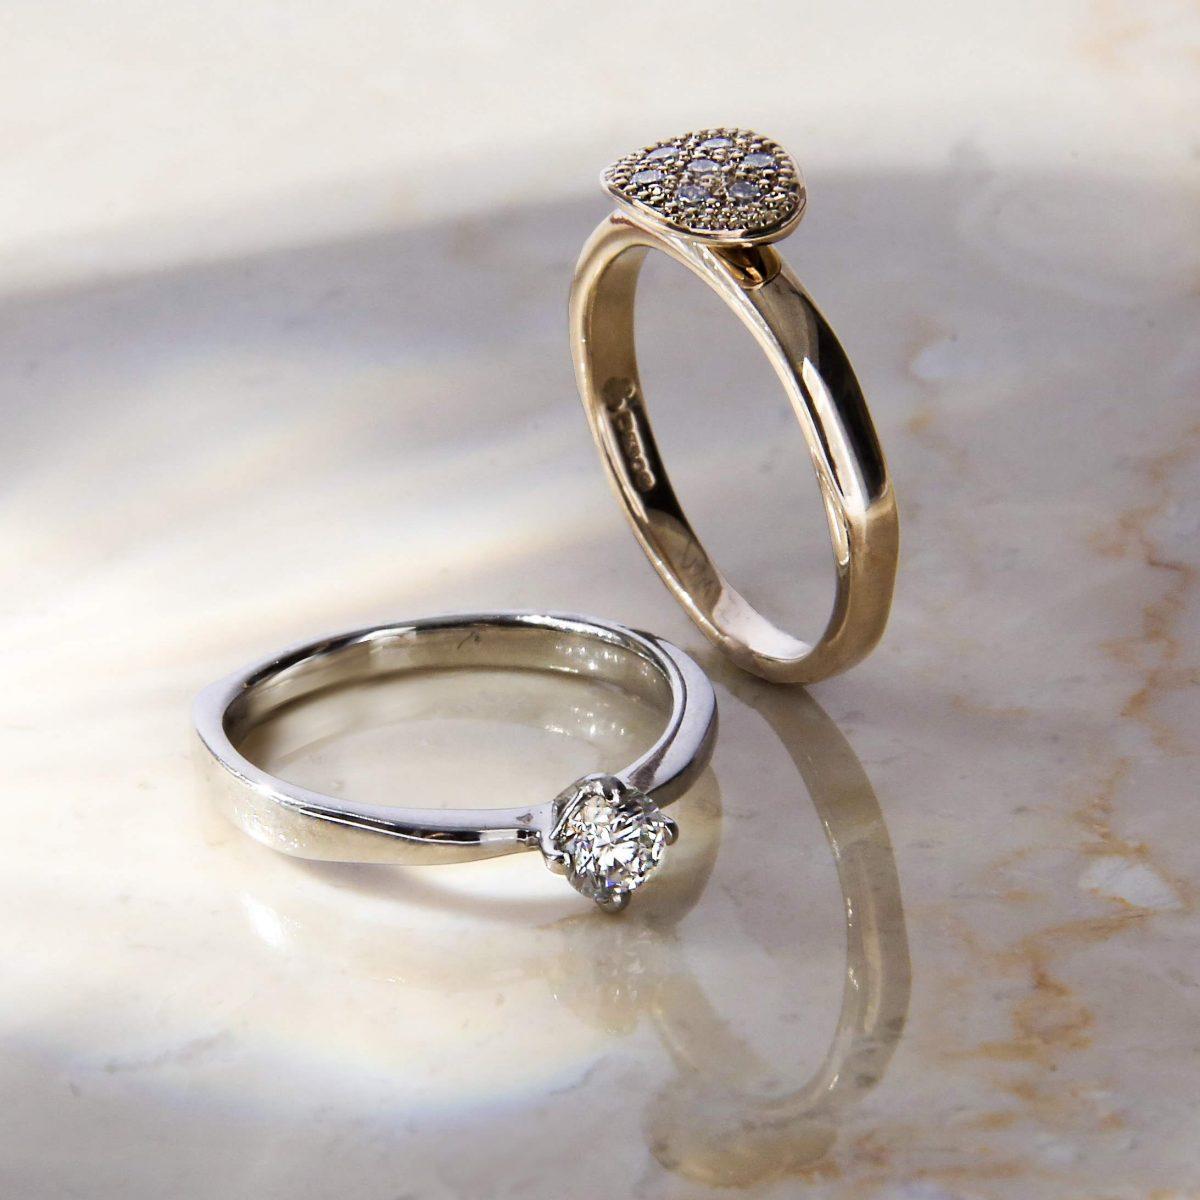 CORINNE HAMAK コリーヌ コリーン ハマック ハマク HPFRNACEBIJOUX アッシュペー 結婚指輪 マリッジ エンゲージ 婚約指輪